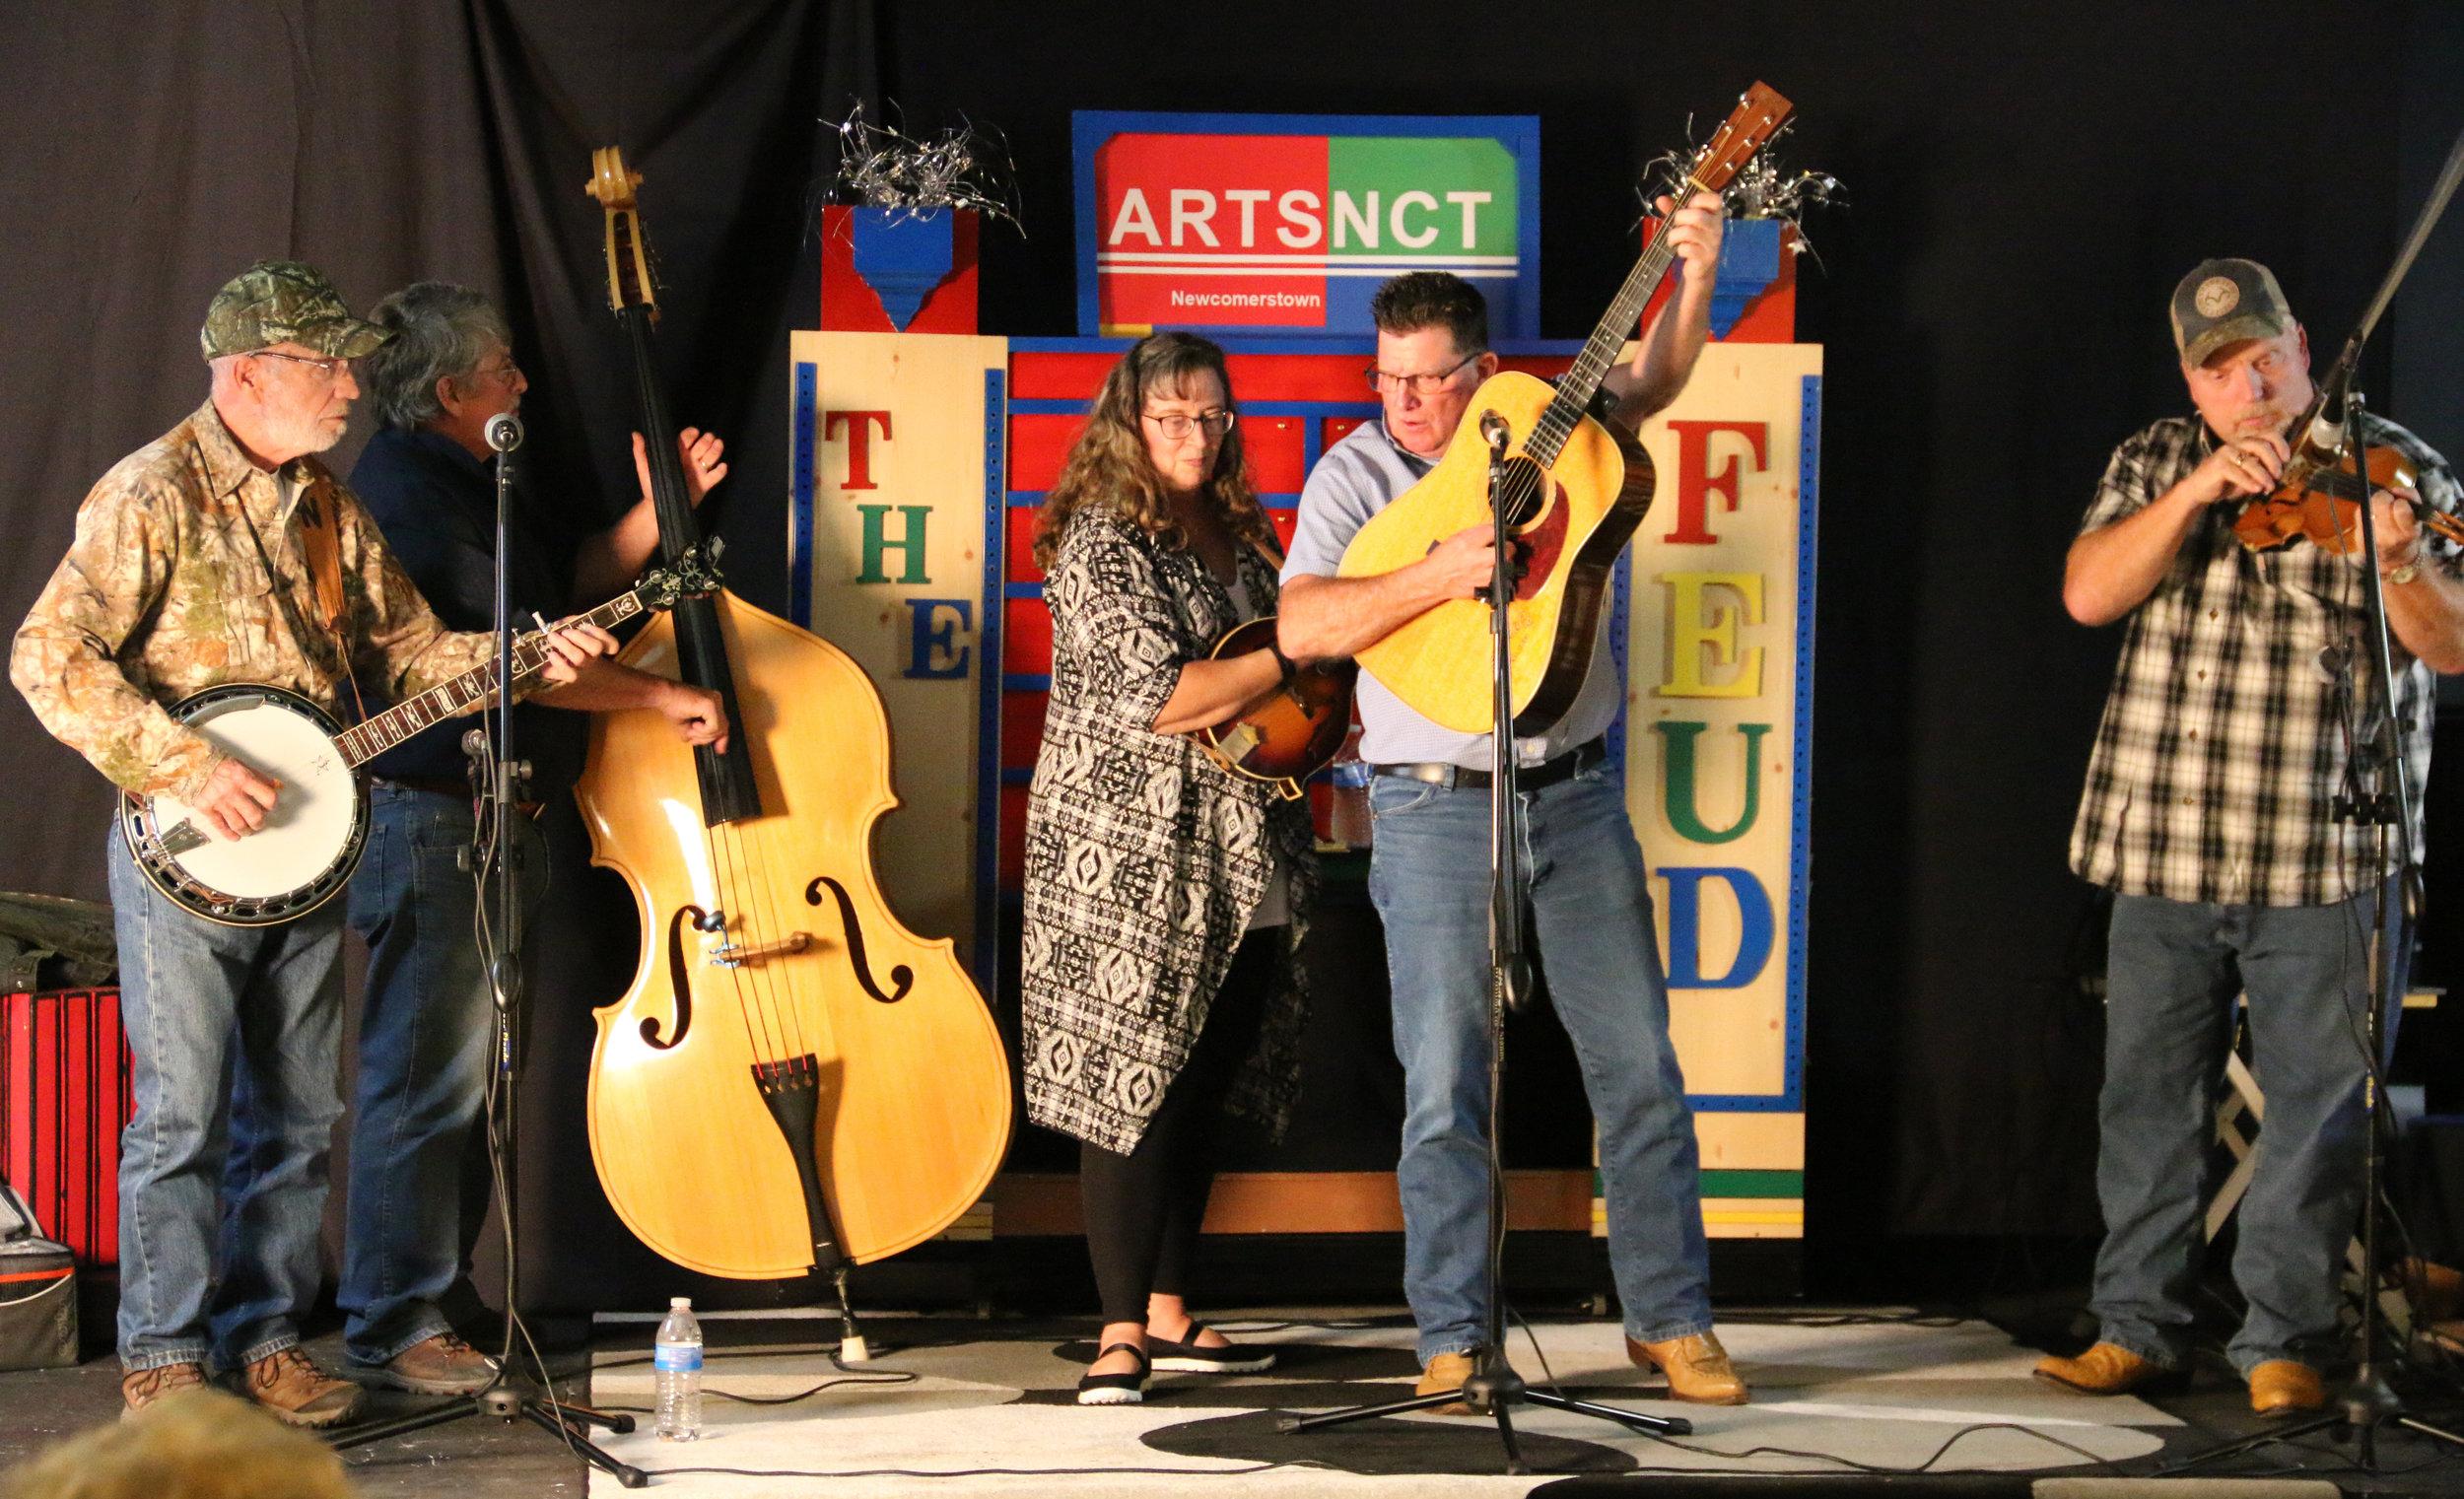 Chestnut Hill Band @artsNCT, Newcomerstown